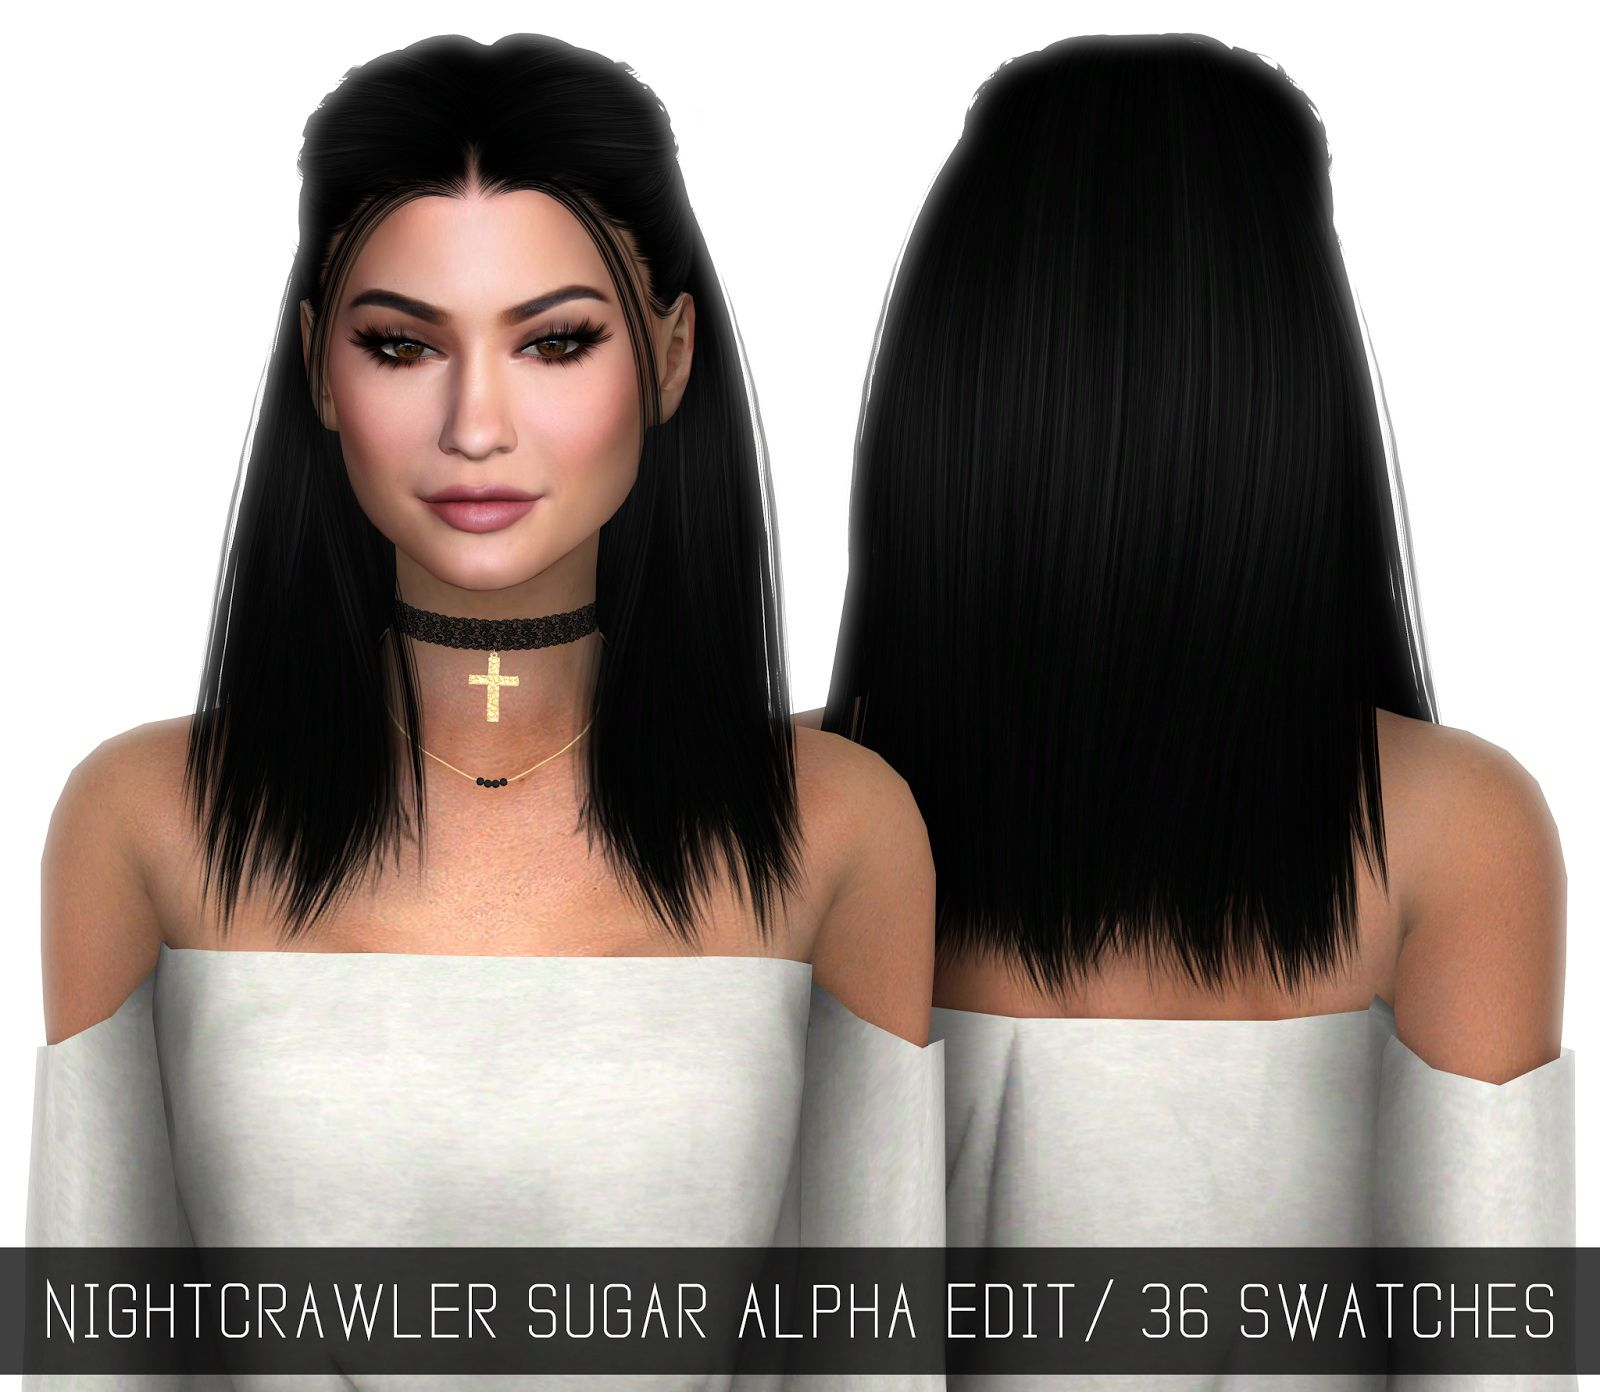 Simpliciaty Nightcrawler s Sugar Hair retextured Pinterest